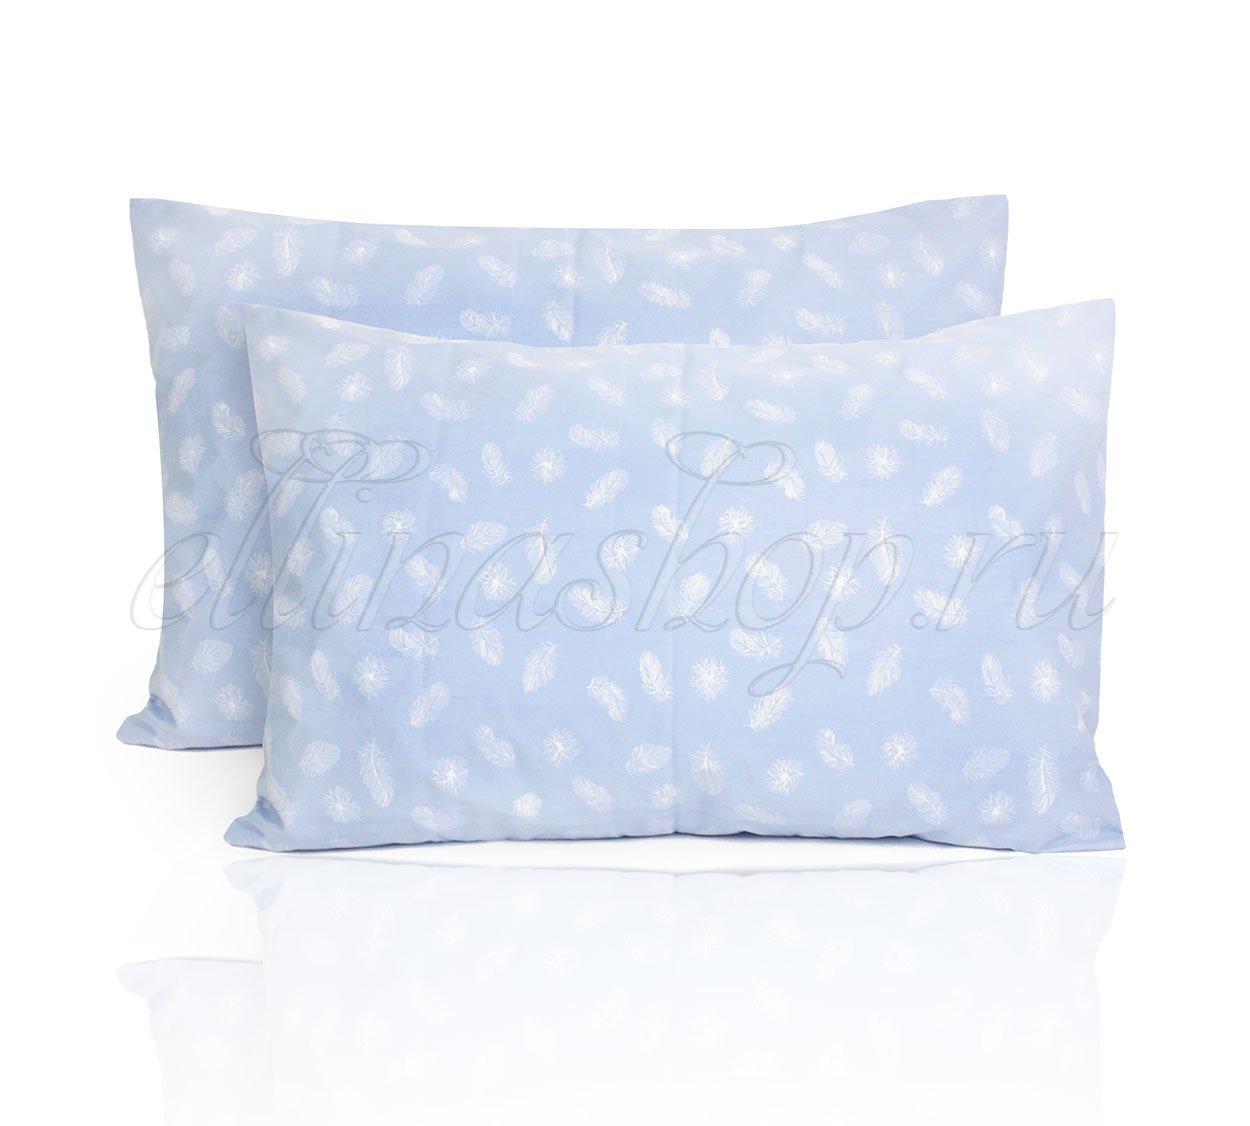 Перышки наволочка (наперник) на подушку Elin